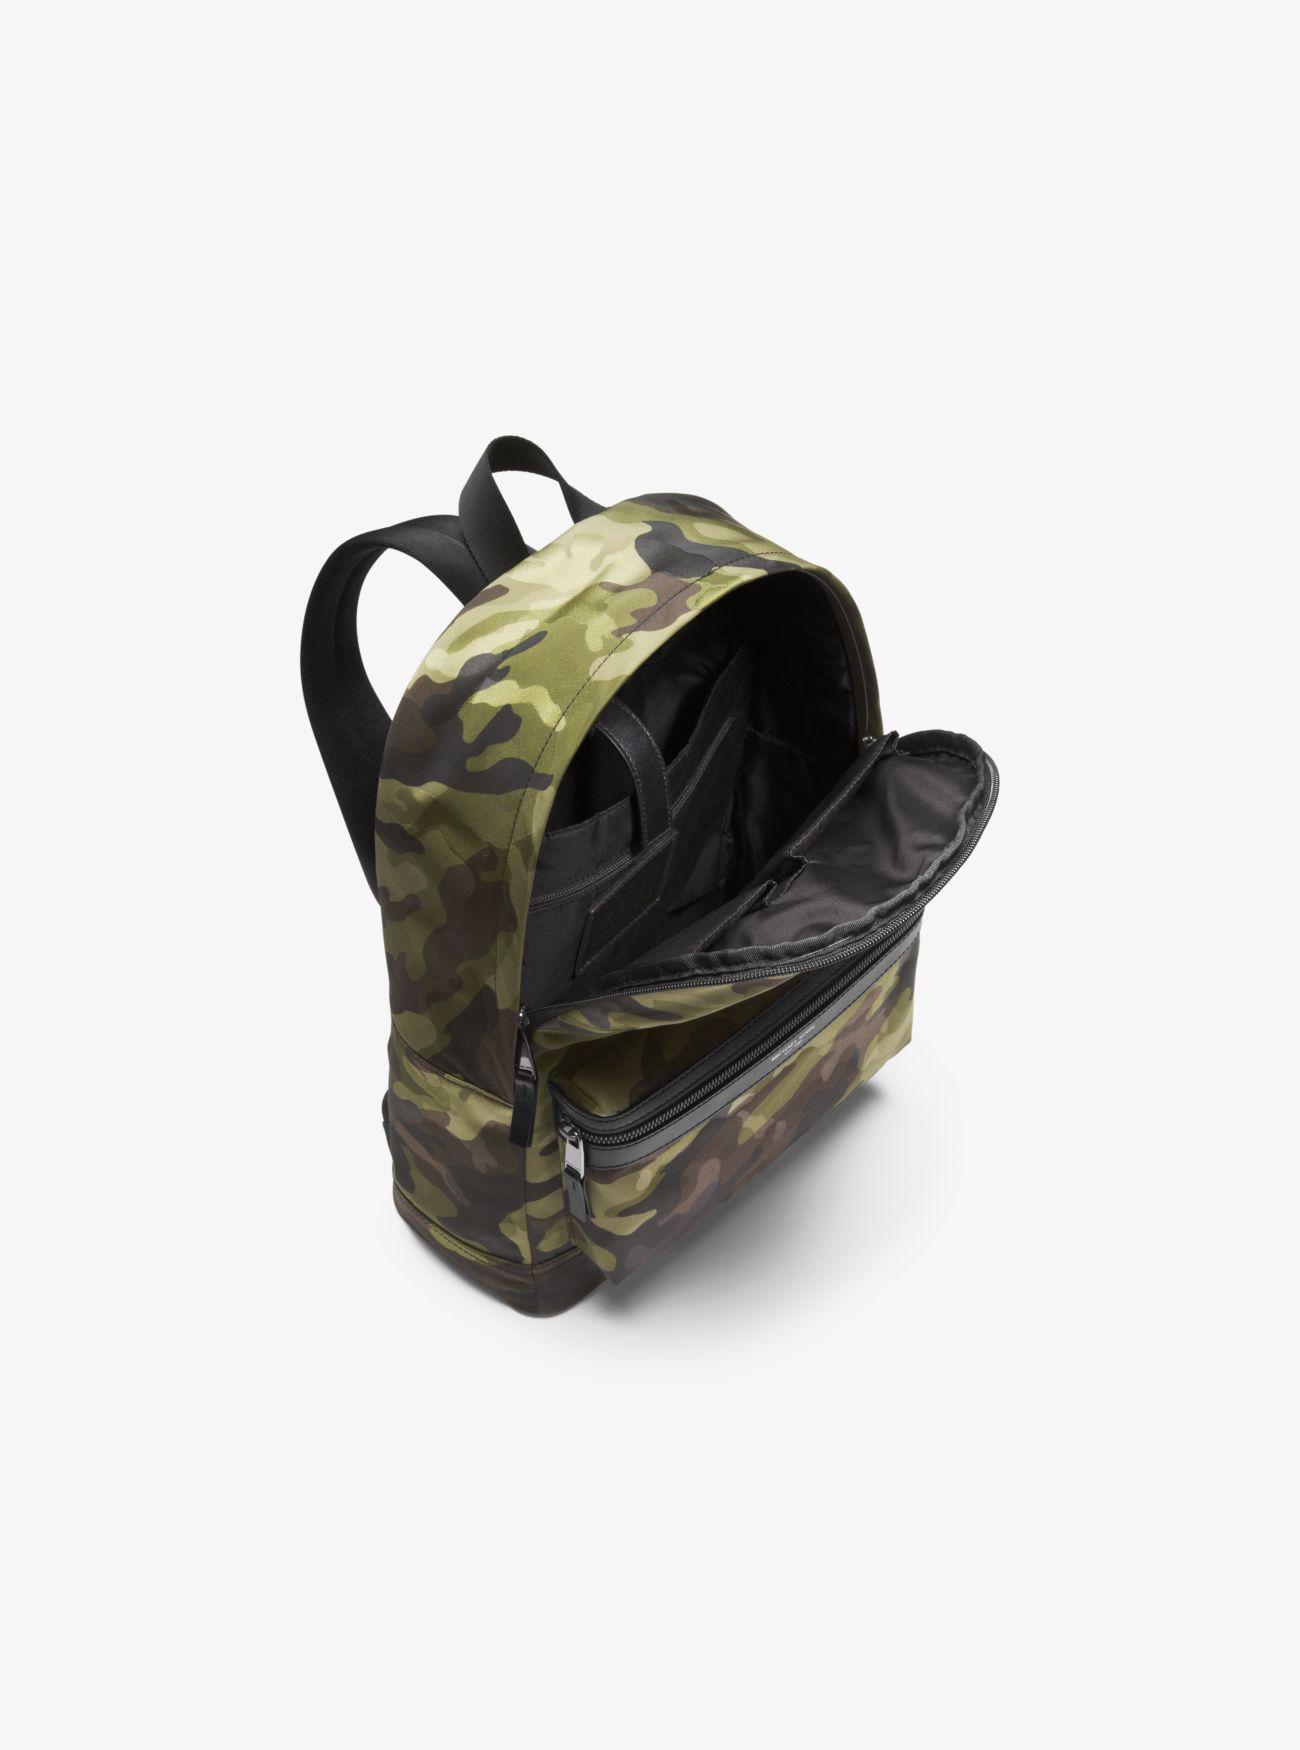 Michael Kors Synthetic Kent Camouflage Backpack